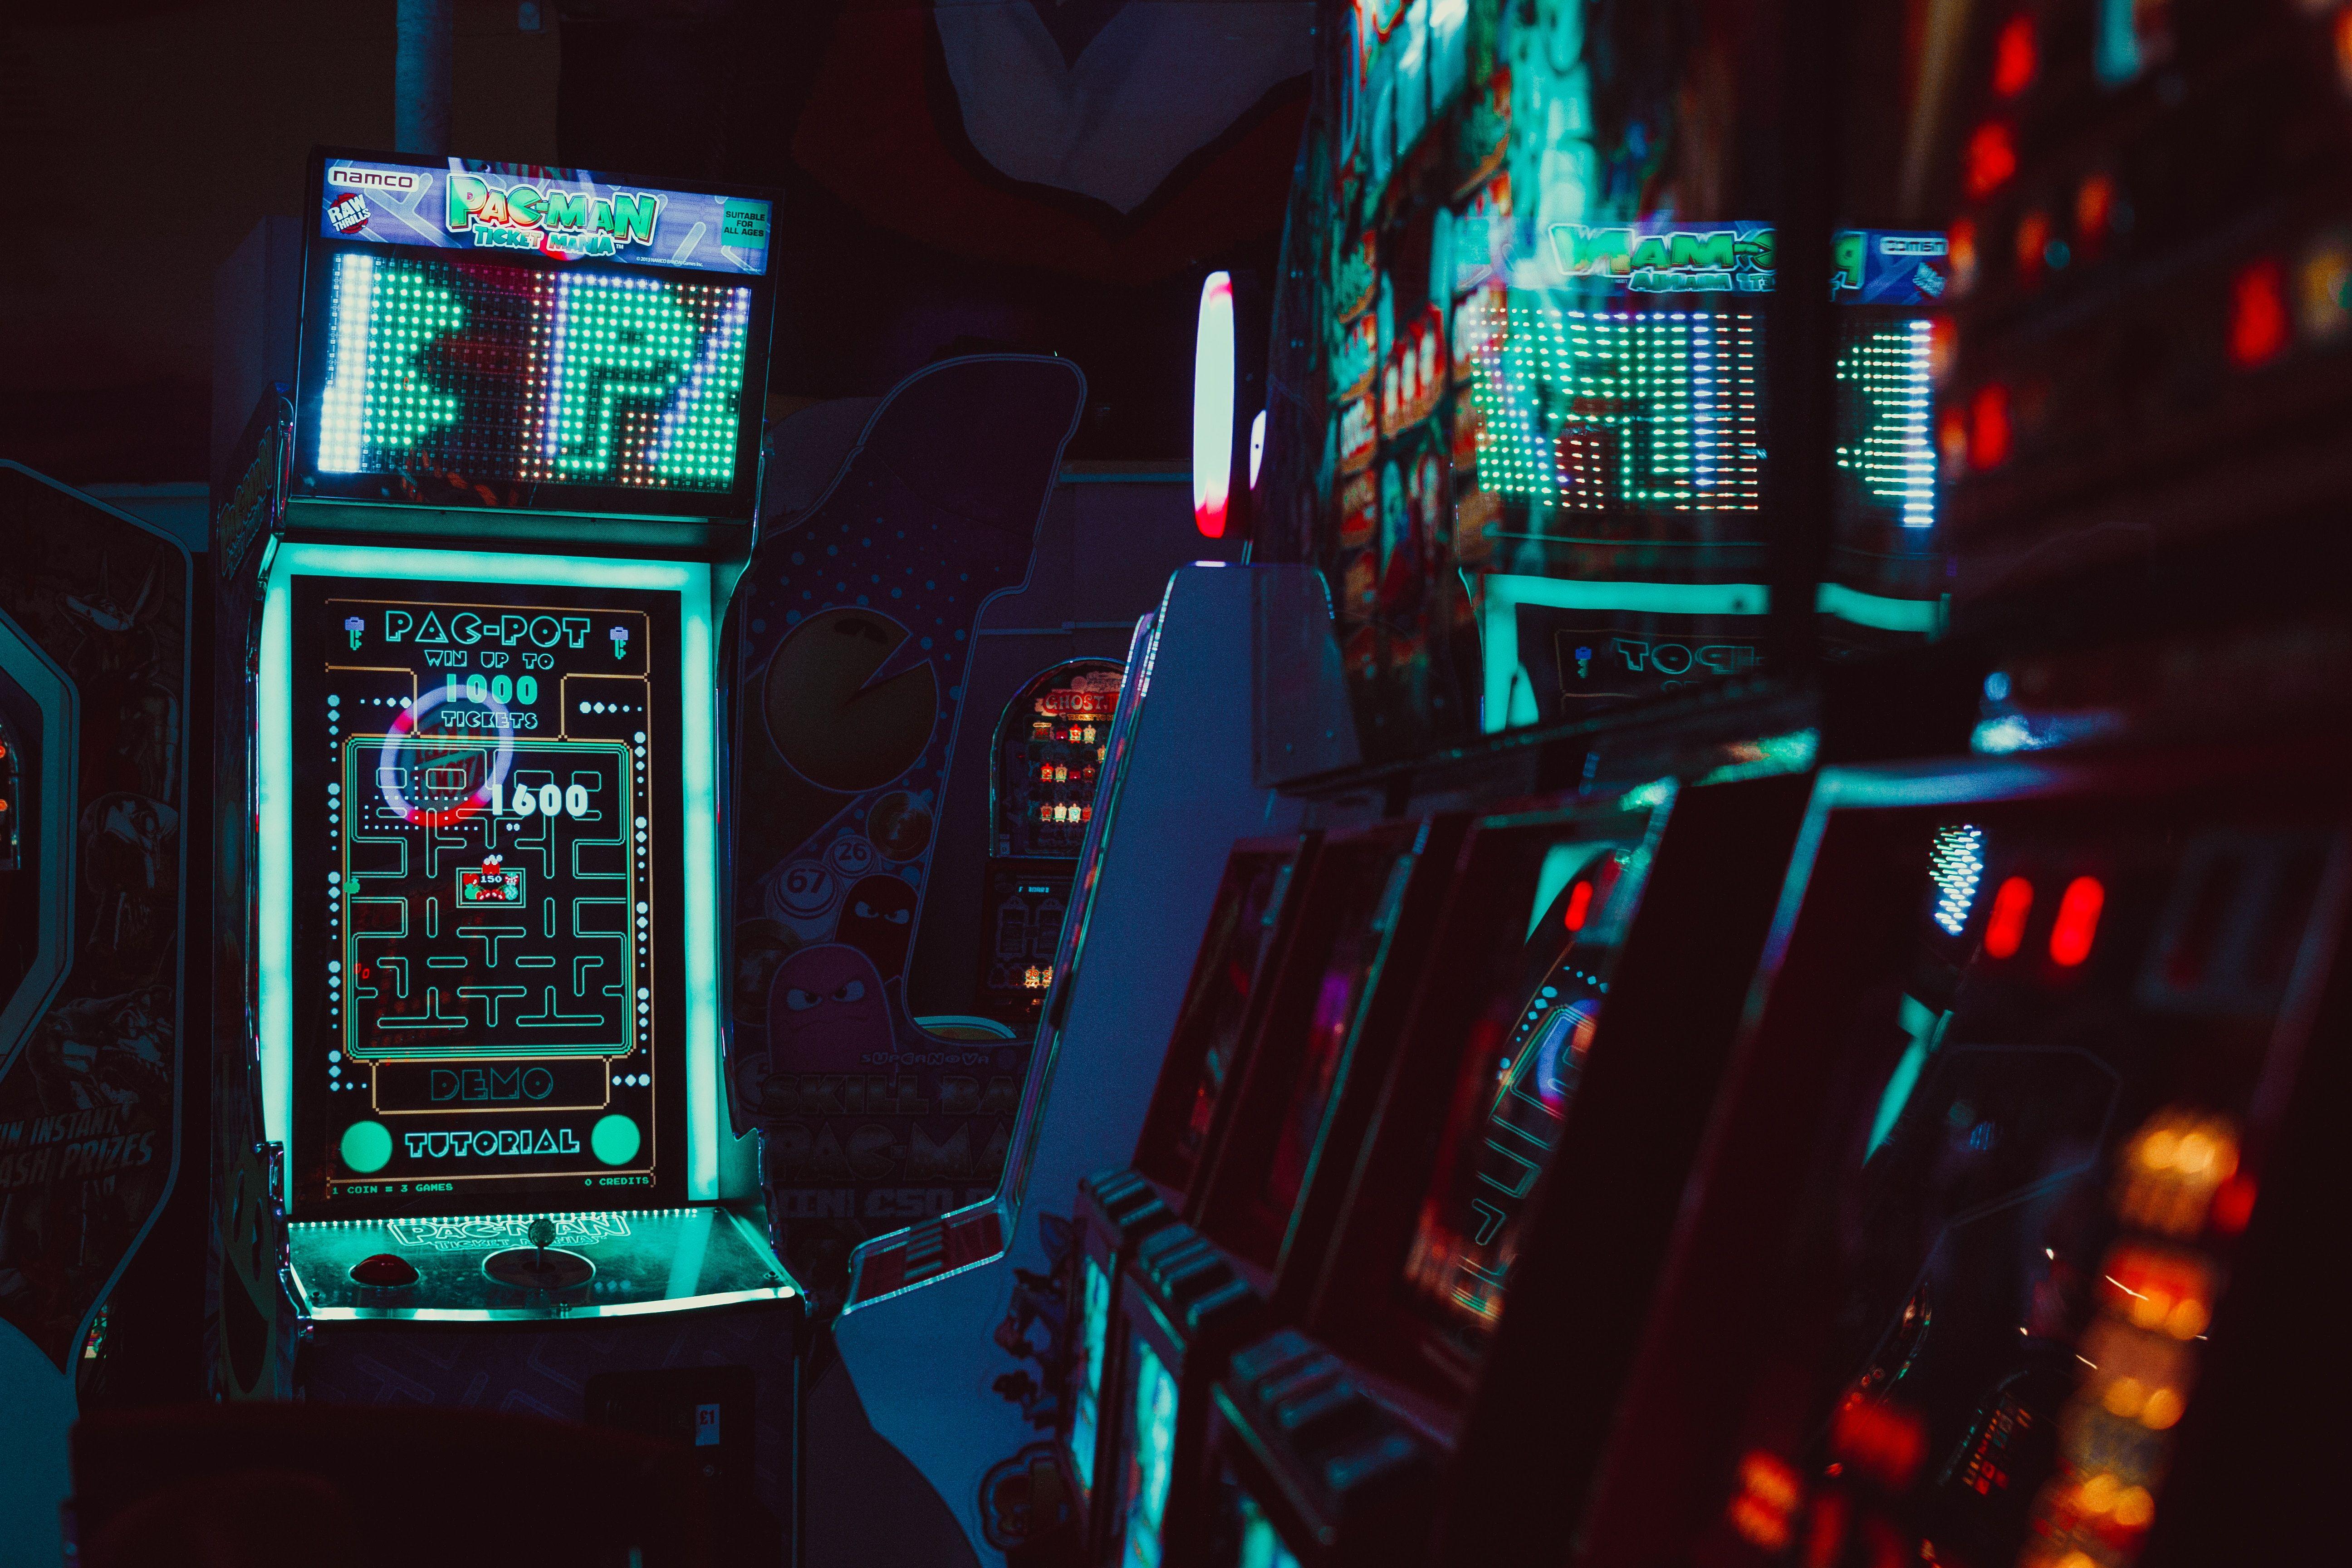 Arcade Retro Games Retro Console Retro Computers Pacman Pac Man Photography 5184x3456